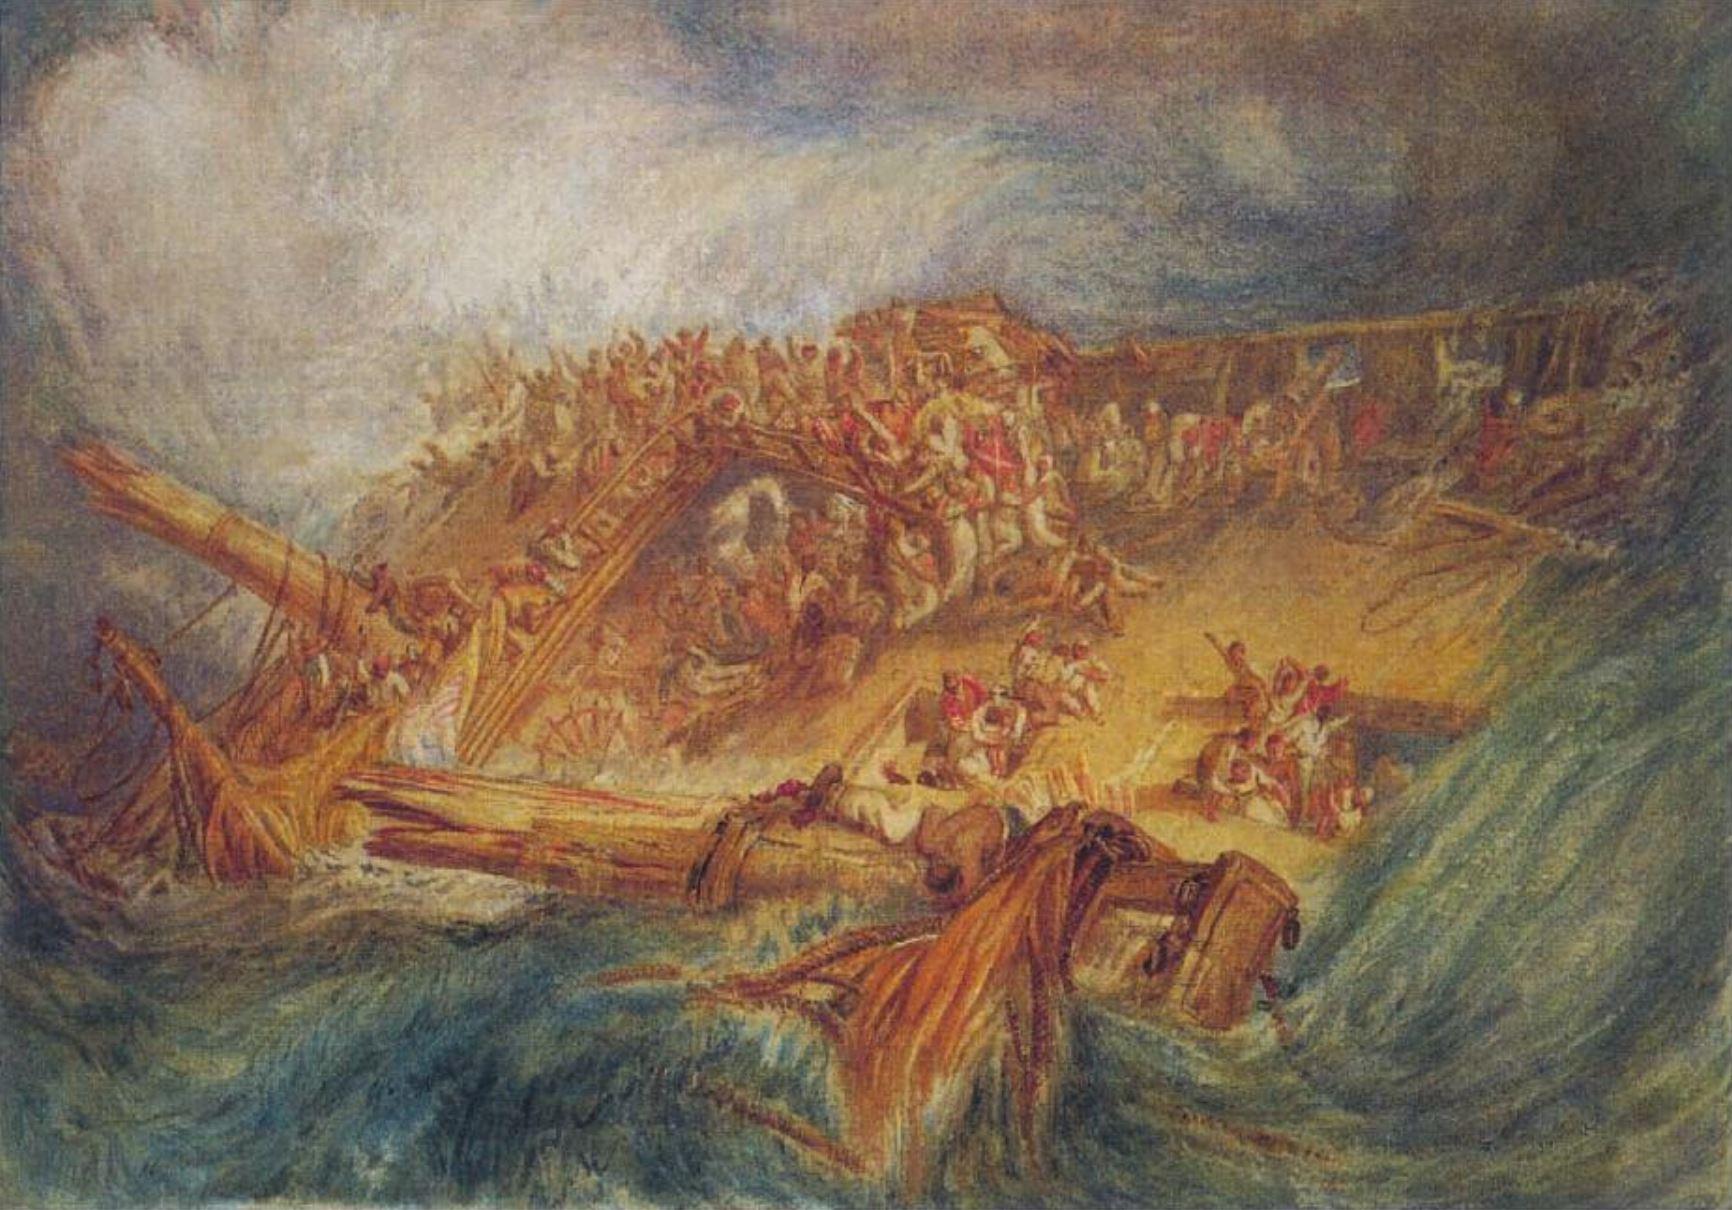 Turner 1818 Perte d'un Indiaman Cecil Higgins Art Gallery Bedford